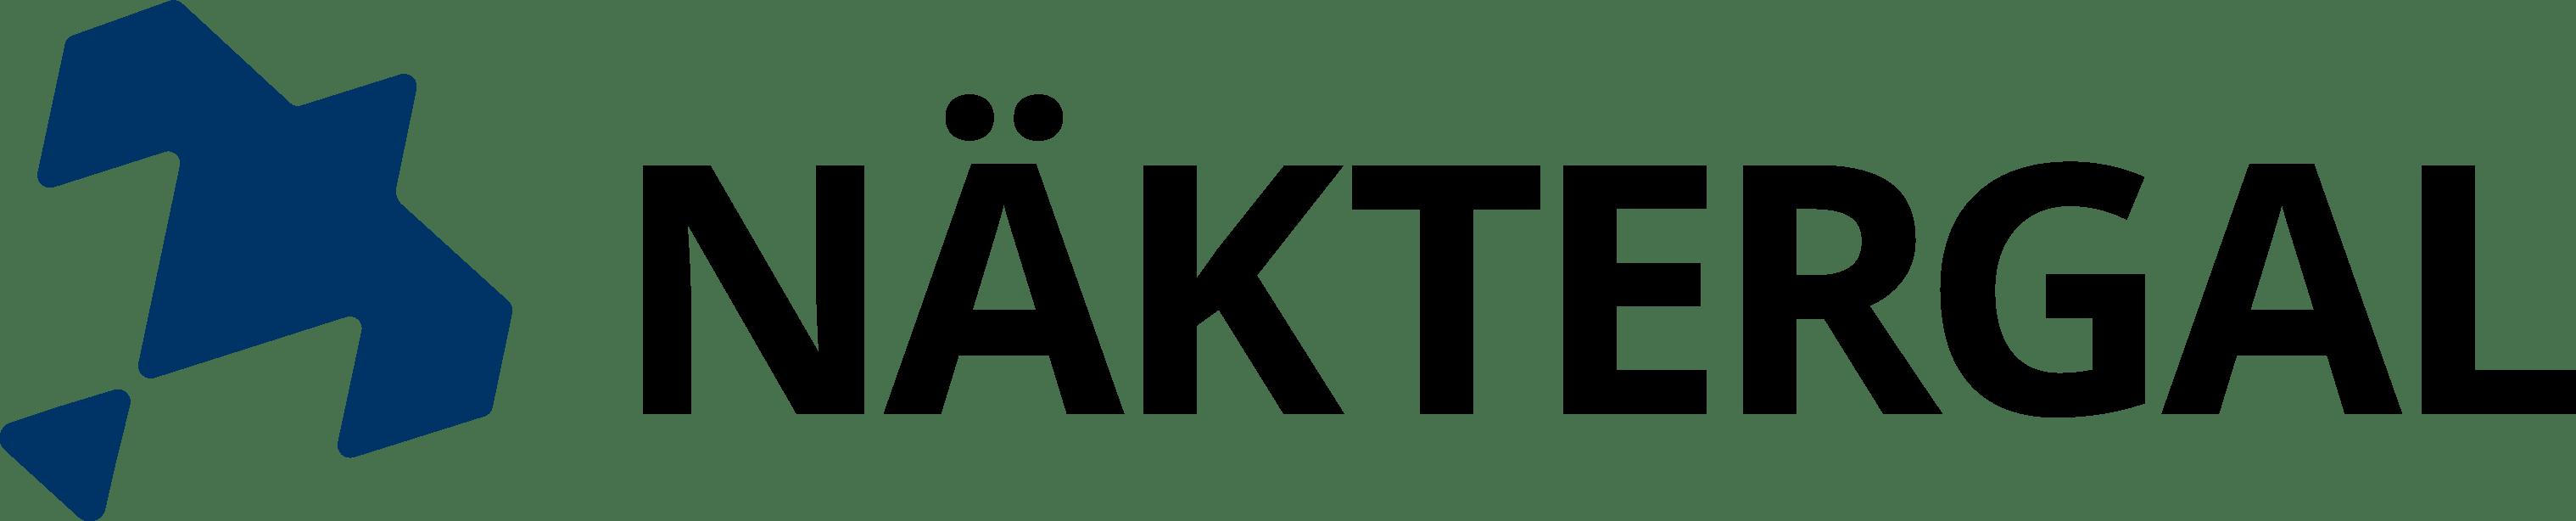 Näktergal | Truly digitised lending| Logo